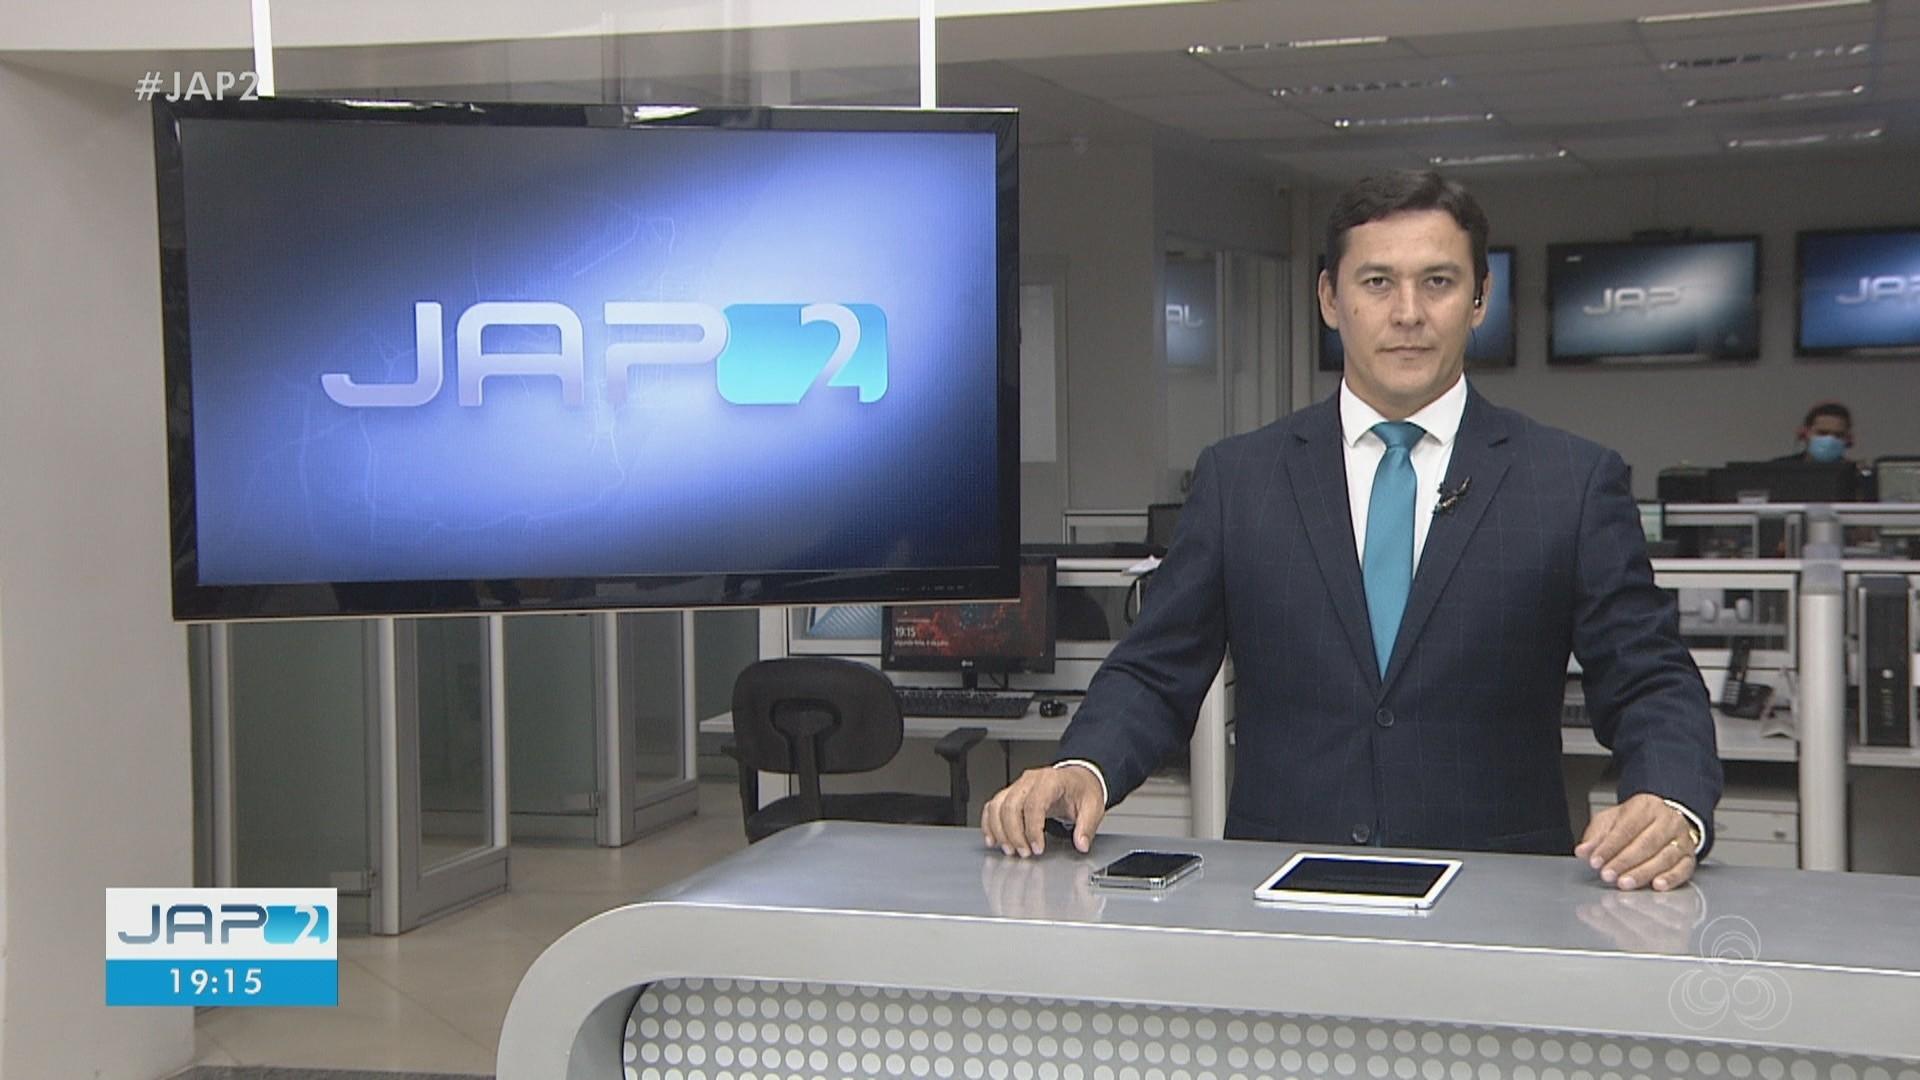 VÍDEOS: JAP2 de segunda-feira, 6 de julho de 2020